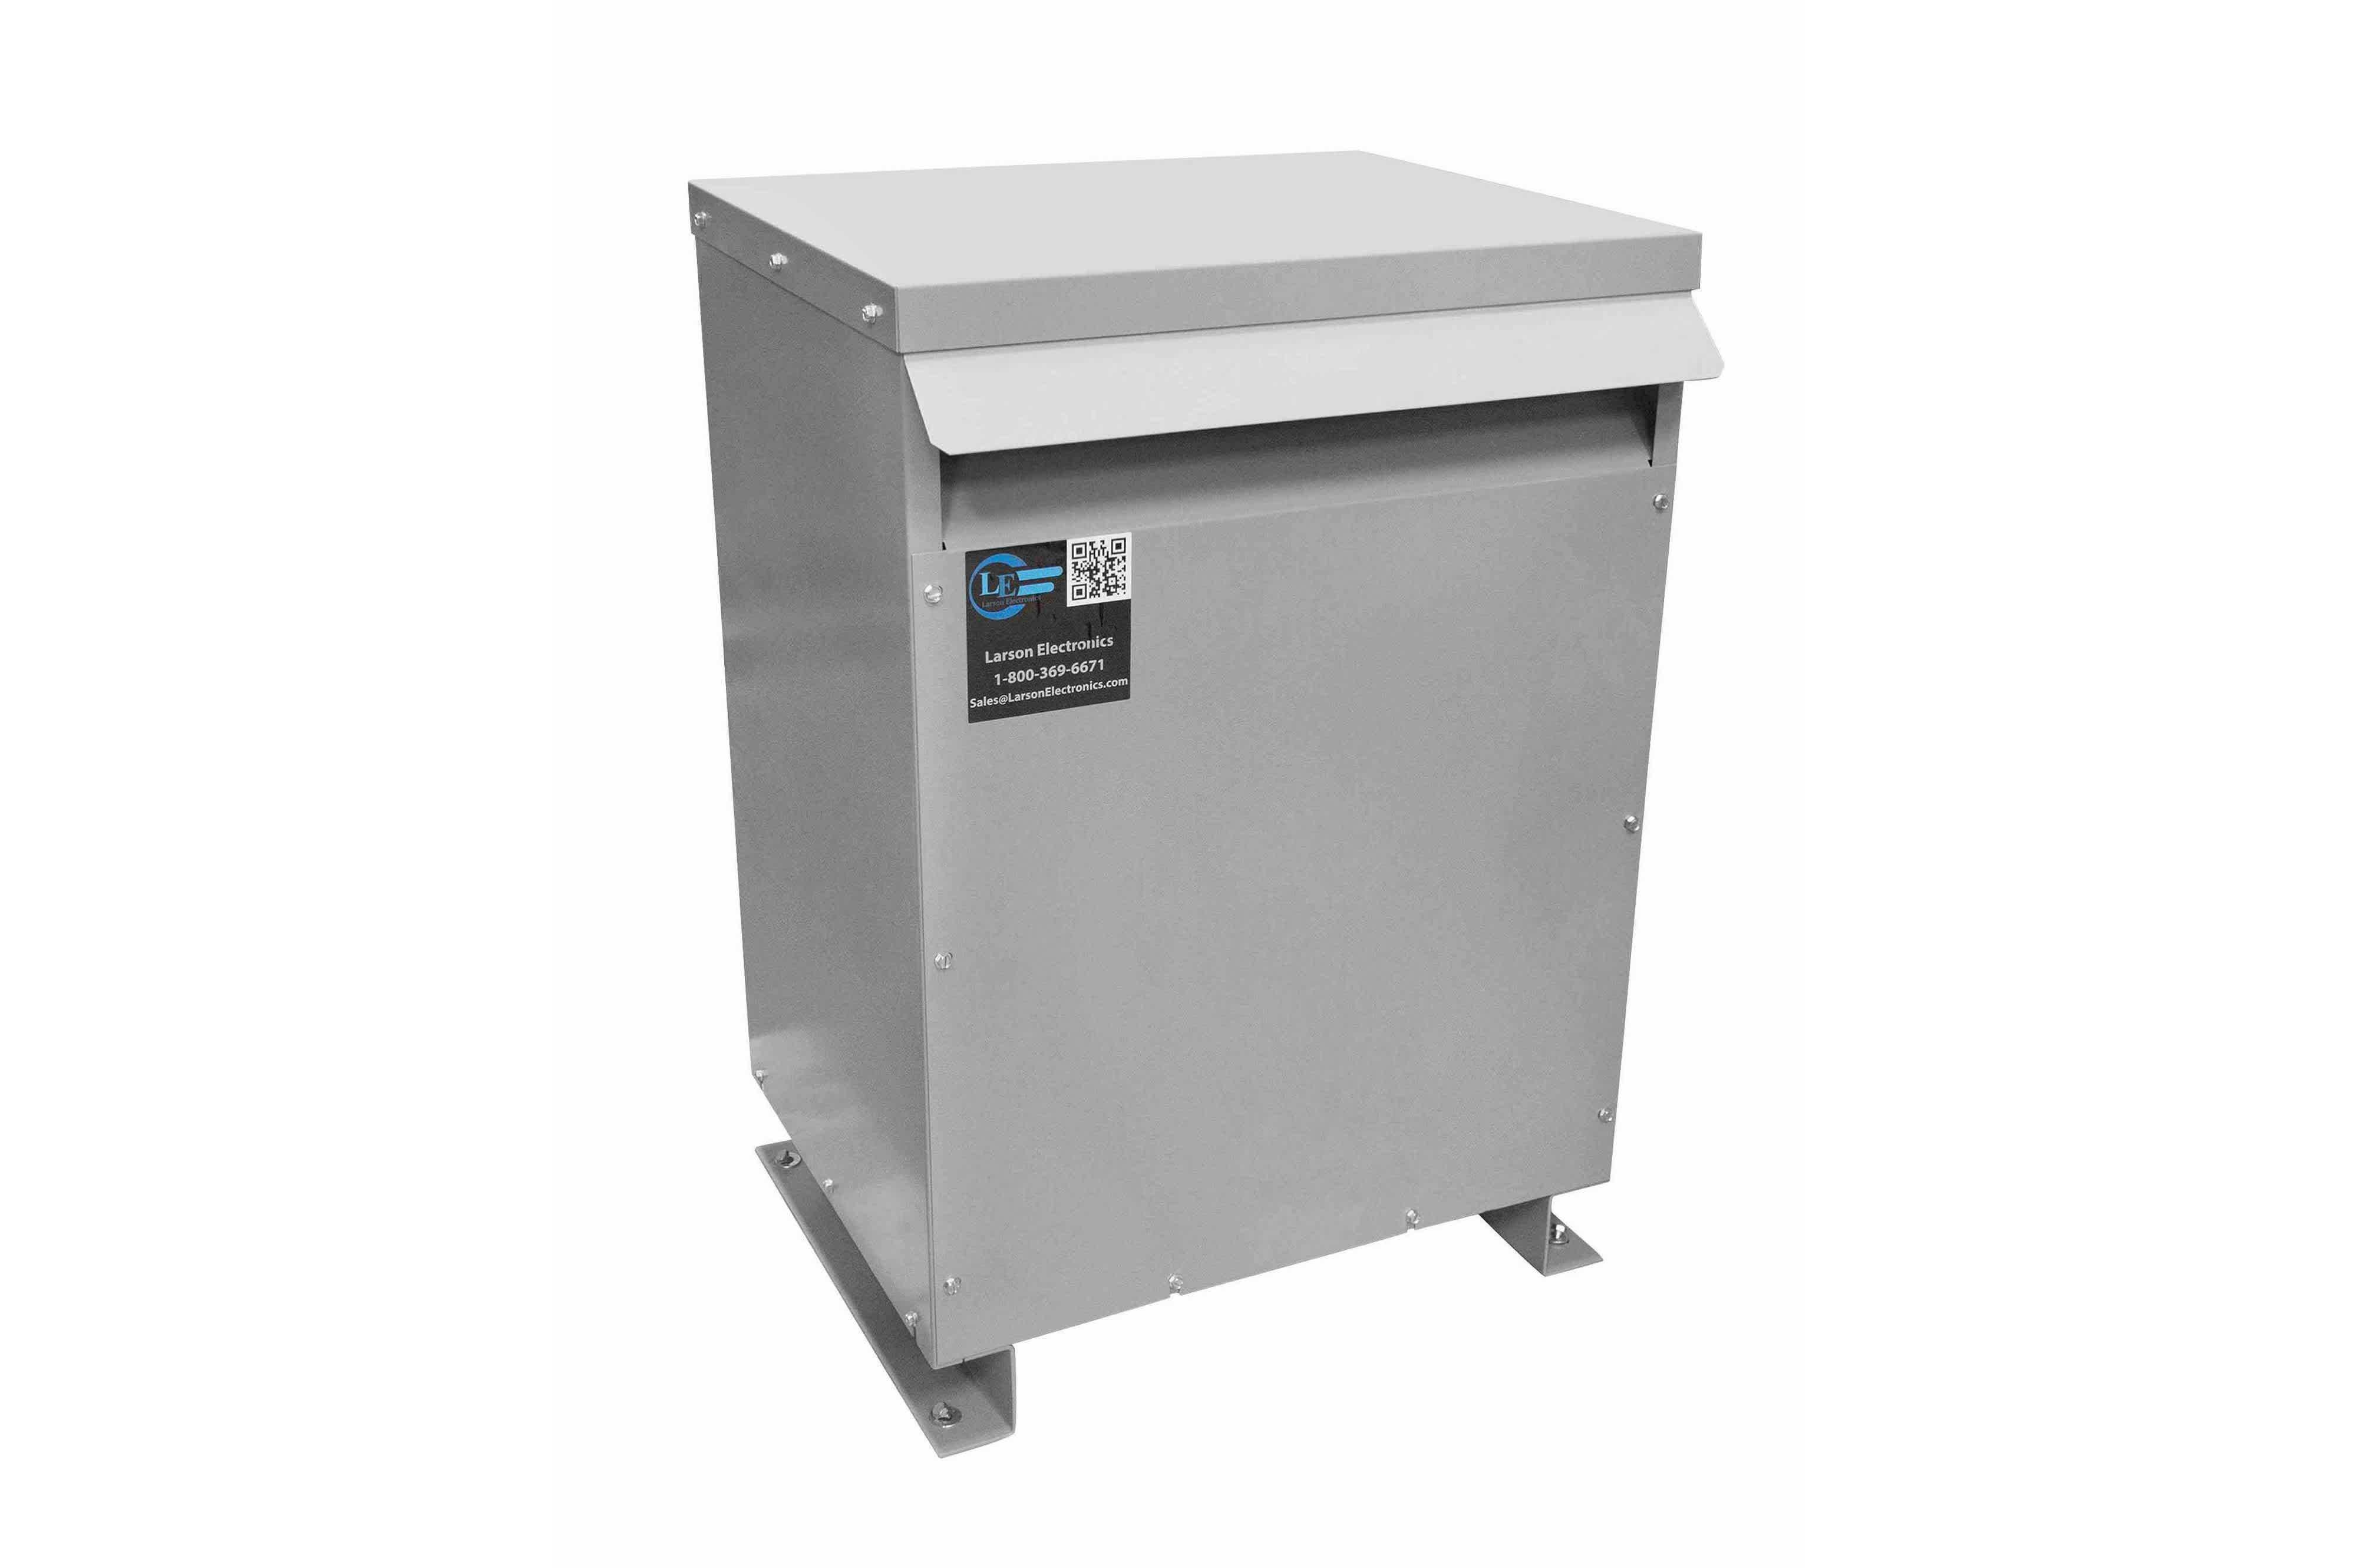 1000 kVA 3PH Isolation Transformer, 220V Wye Primary, 208Y/120 Wye-N Secondary, N3R, Ventilated, 60 Hz